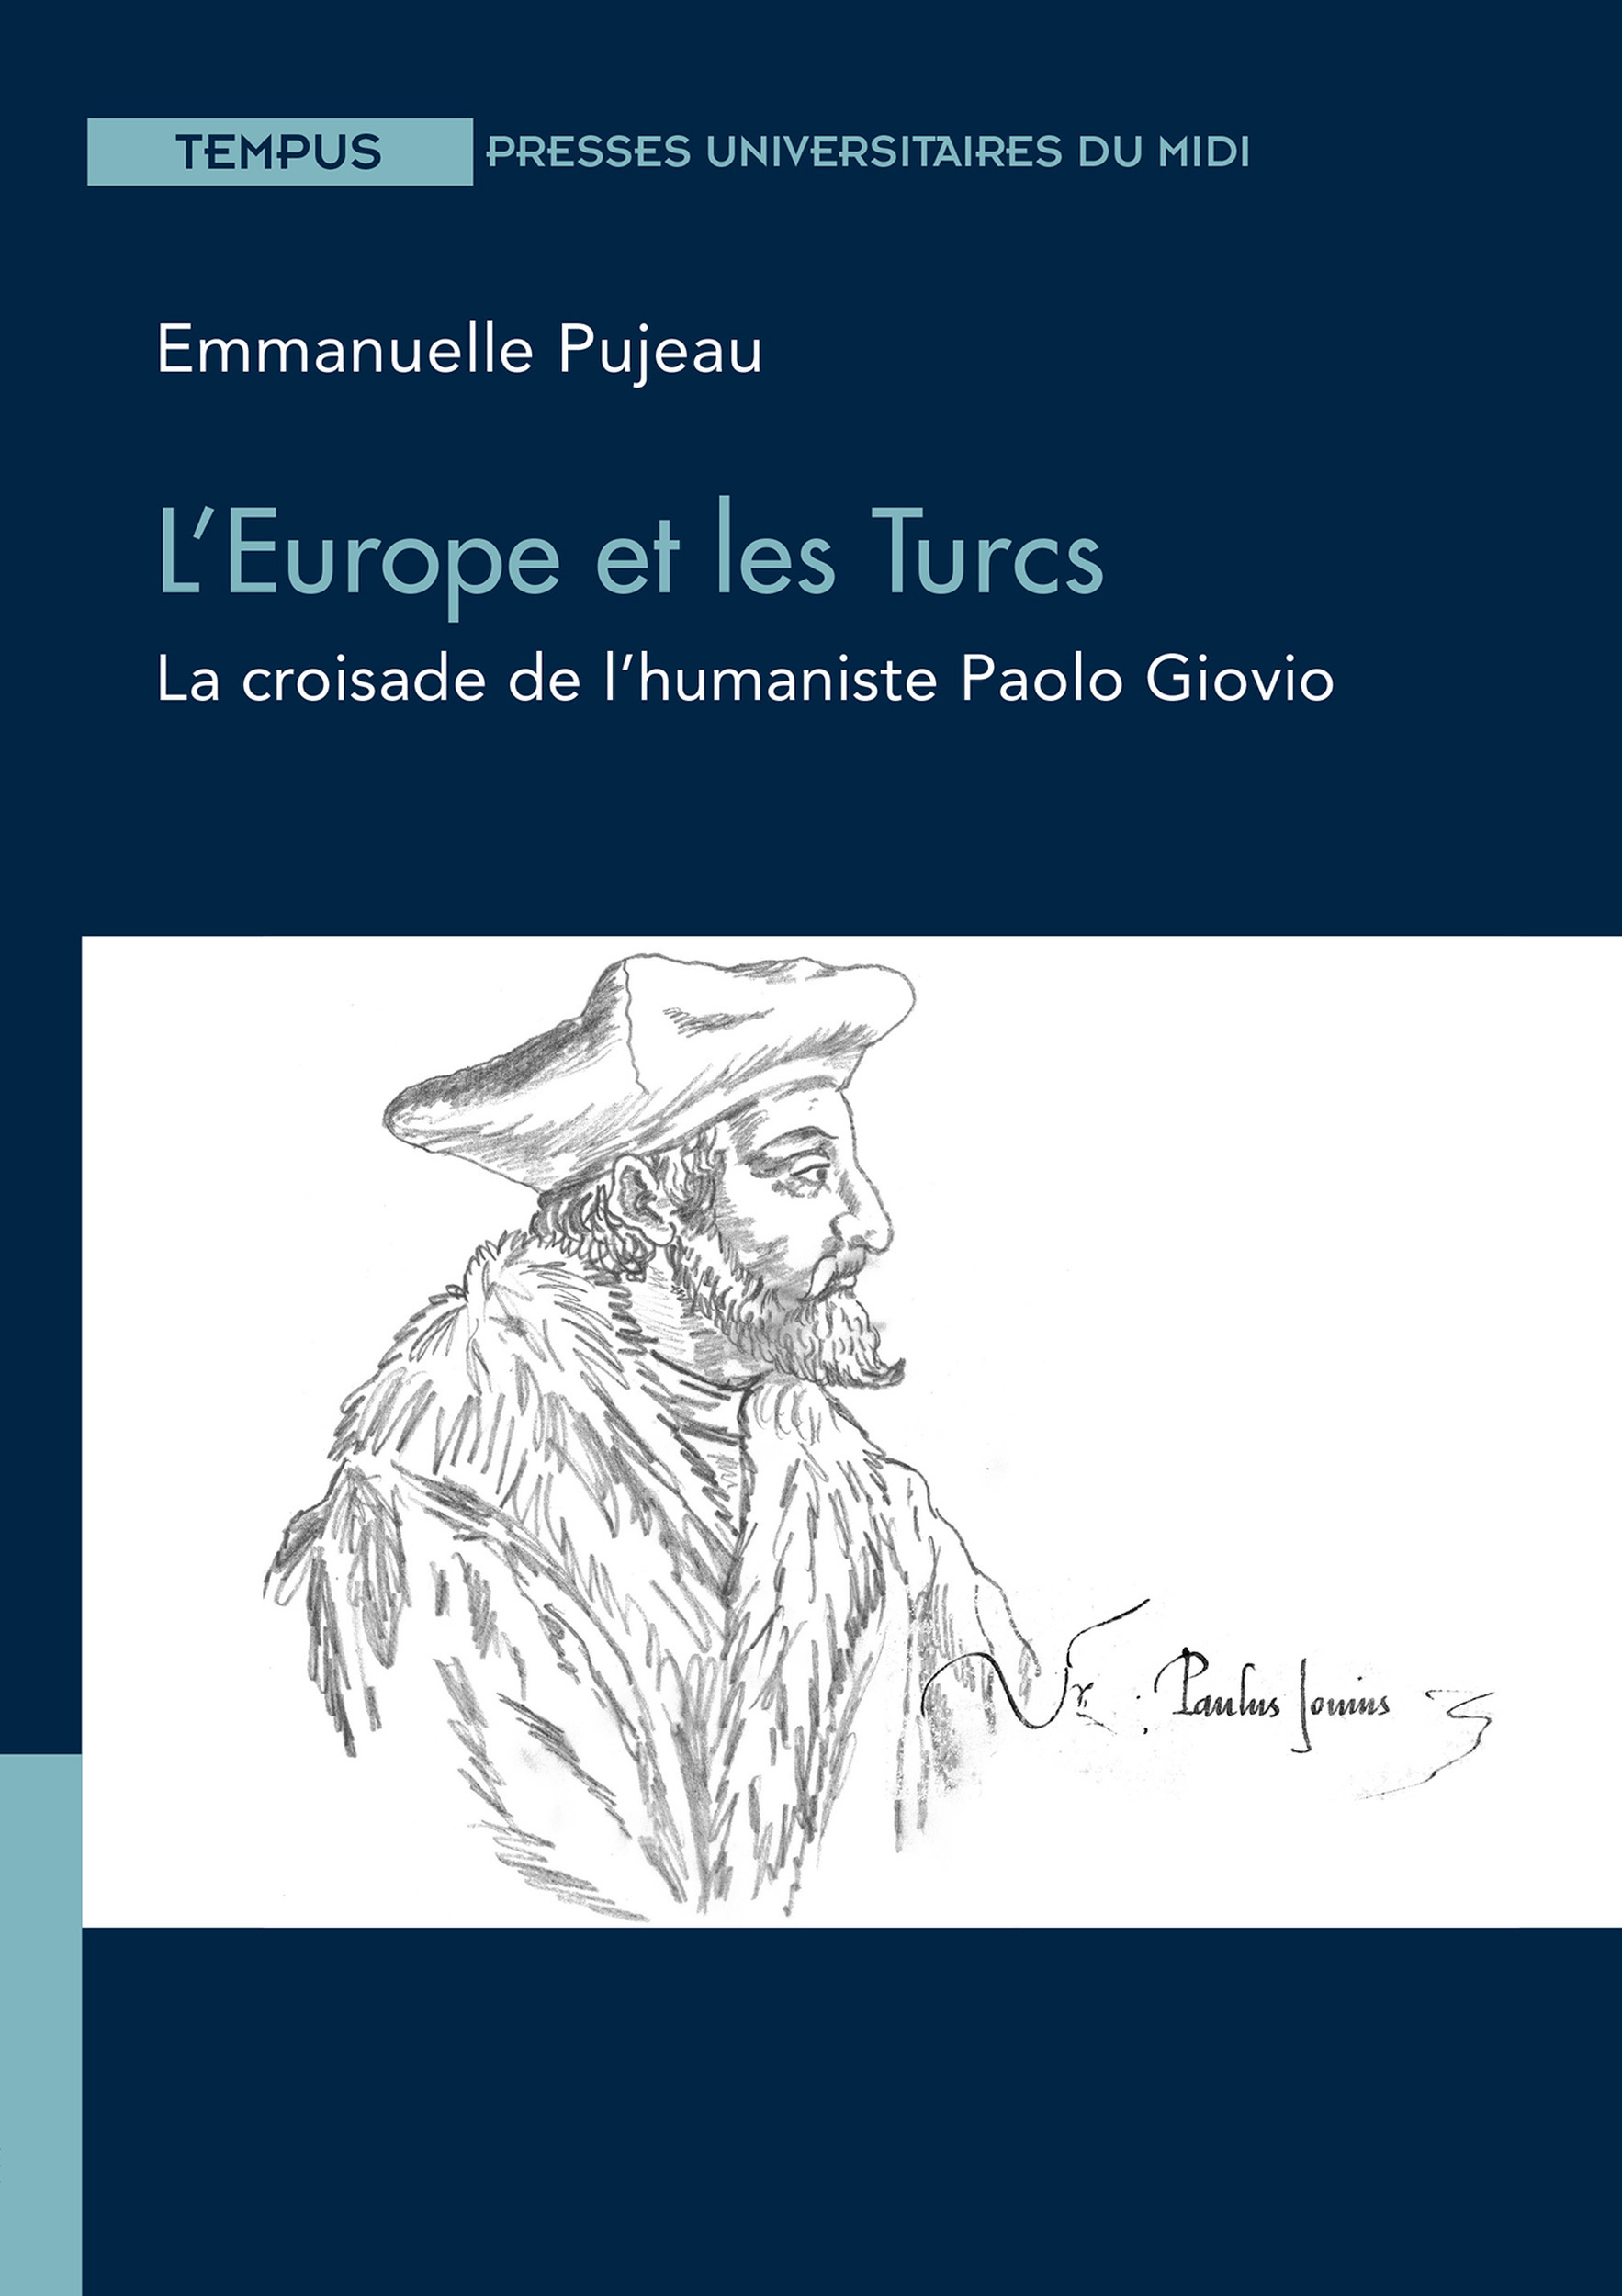 L'Europe et les turcs ; la croisade de l'humaniste Paolo Giovio